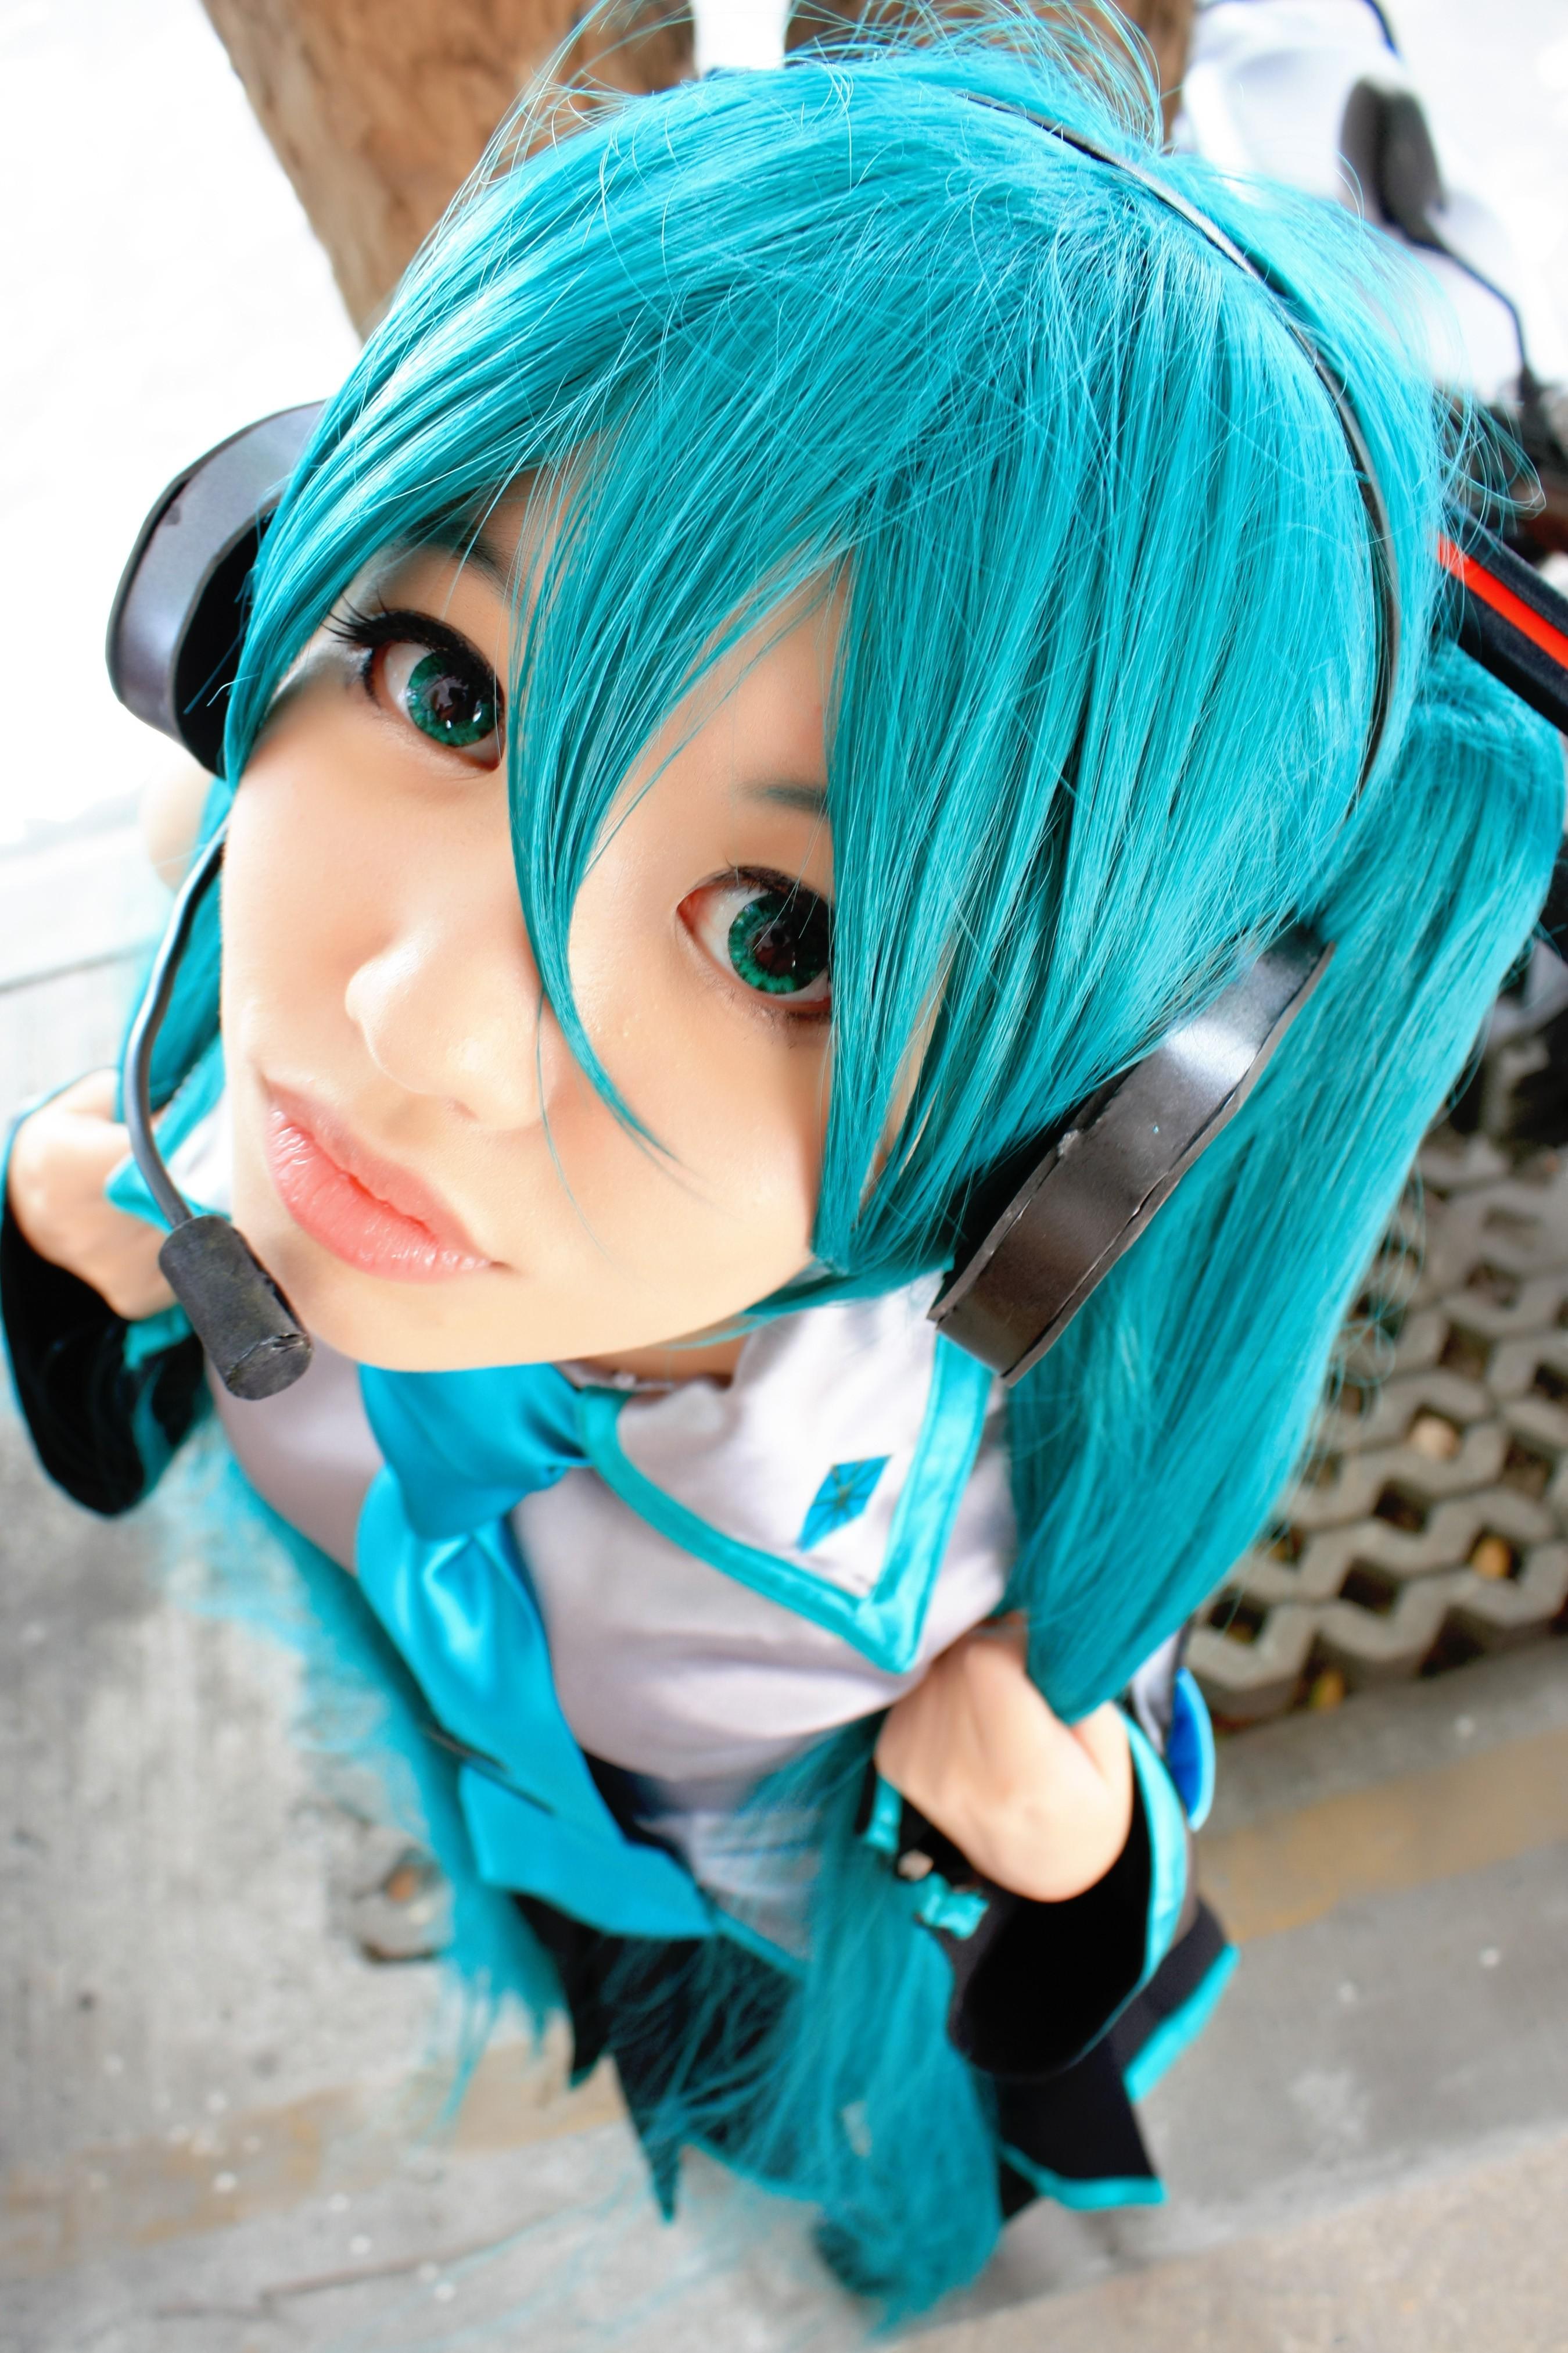 hatsune miku cosplay - photo #41